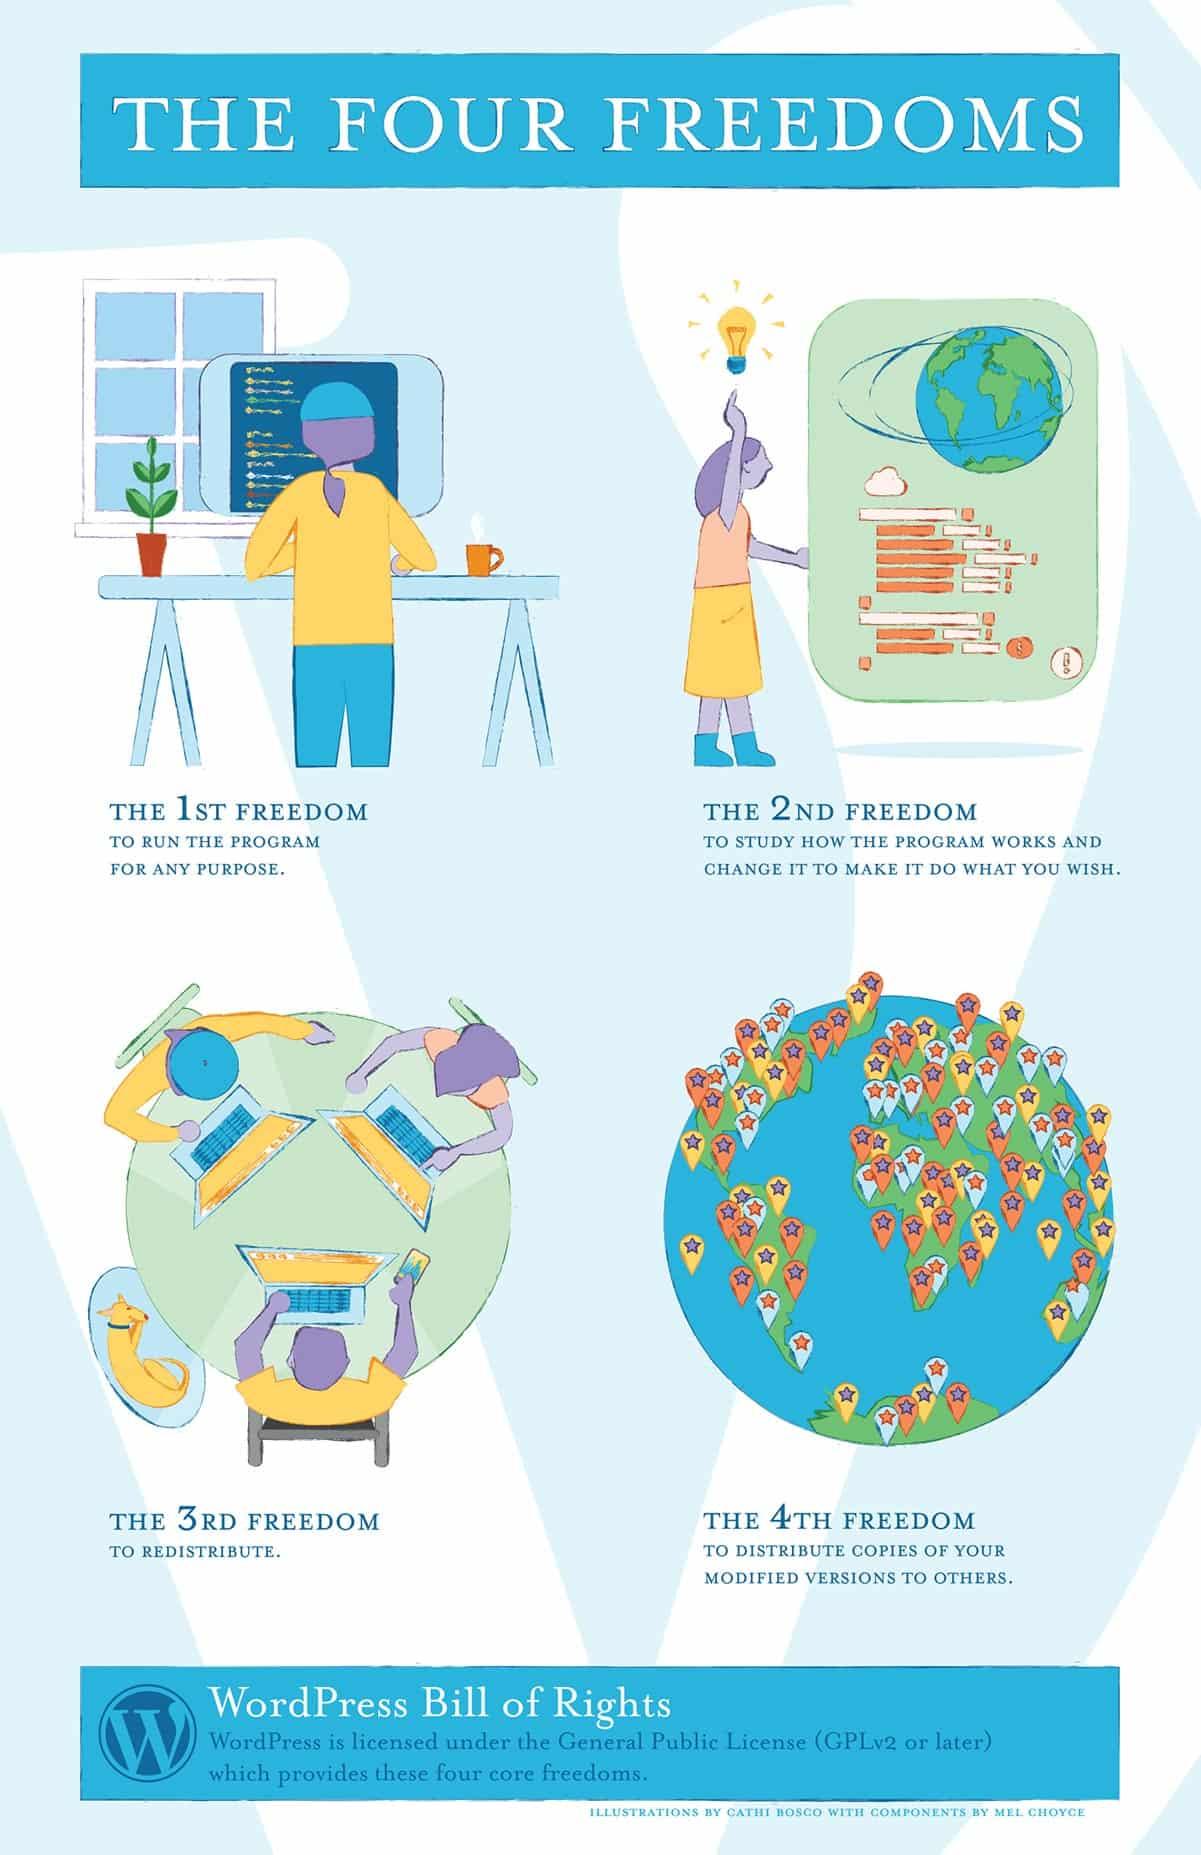 Cathi Bosco contribution to WordPress: an illustration of the four freedoms.